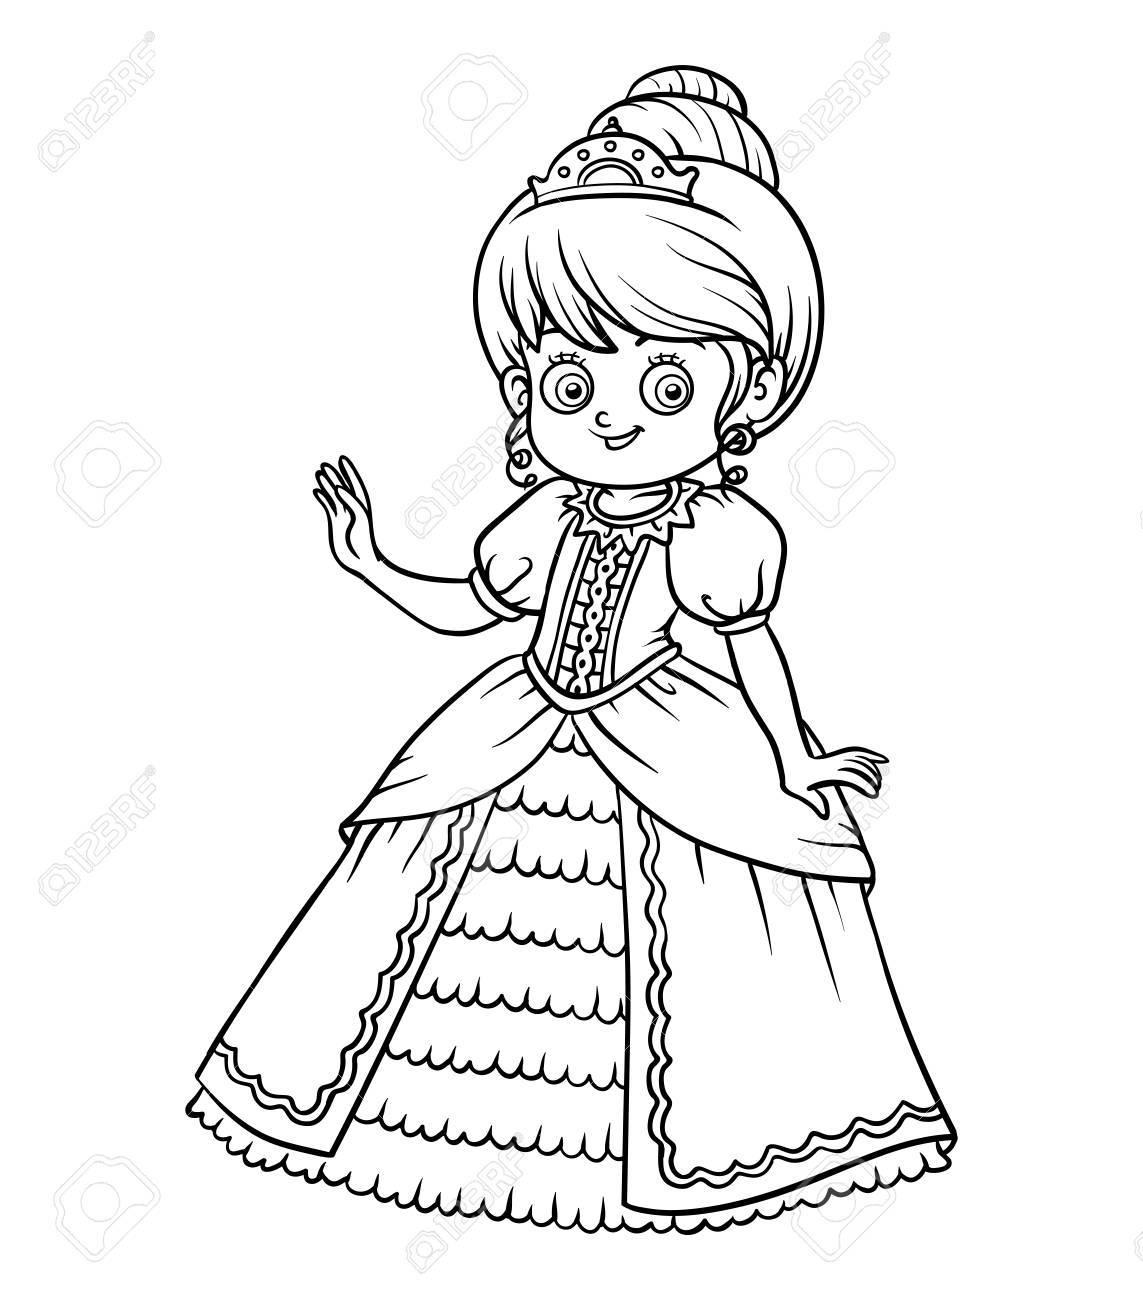 Dibujos Para Ninos Para Colorear De Princesas Dibujos Para